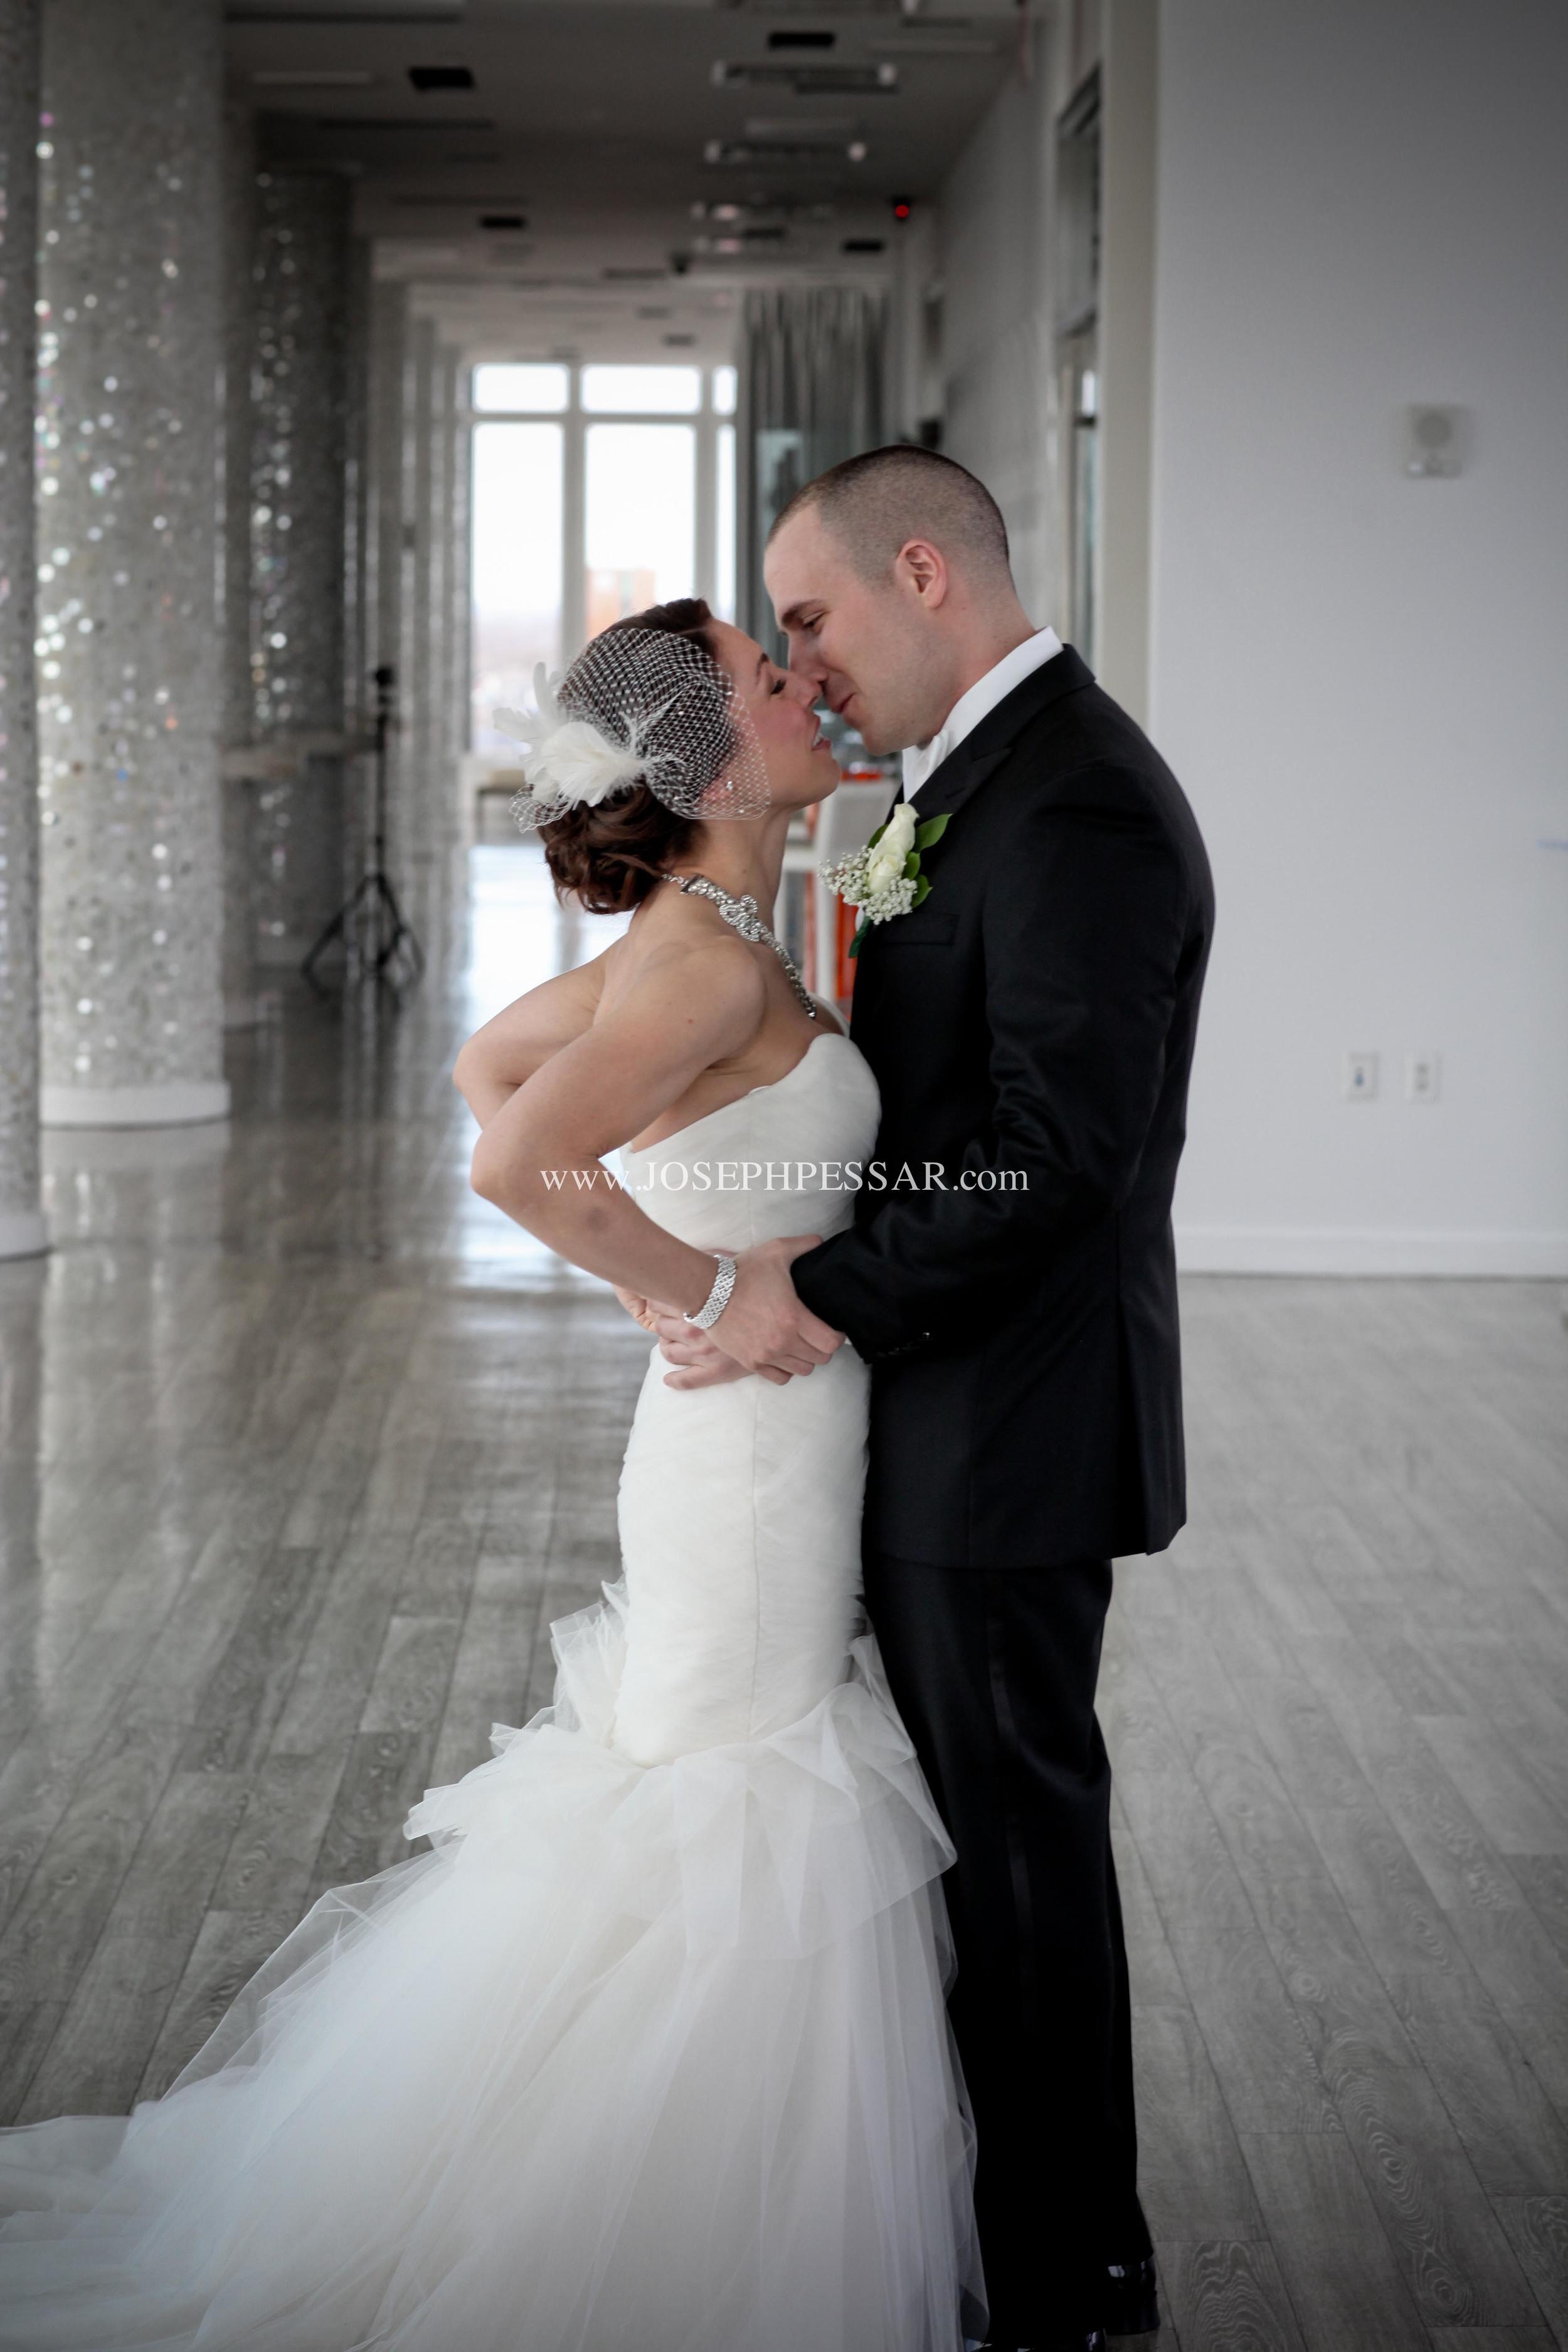 nyc_wedding_photographer0016.jpg